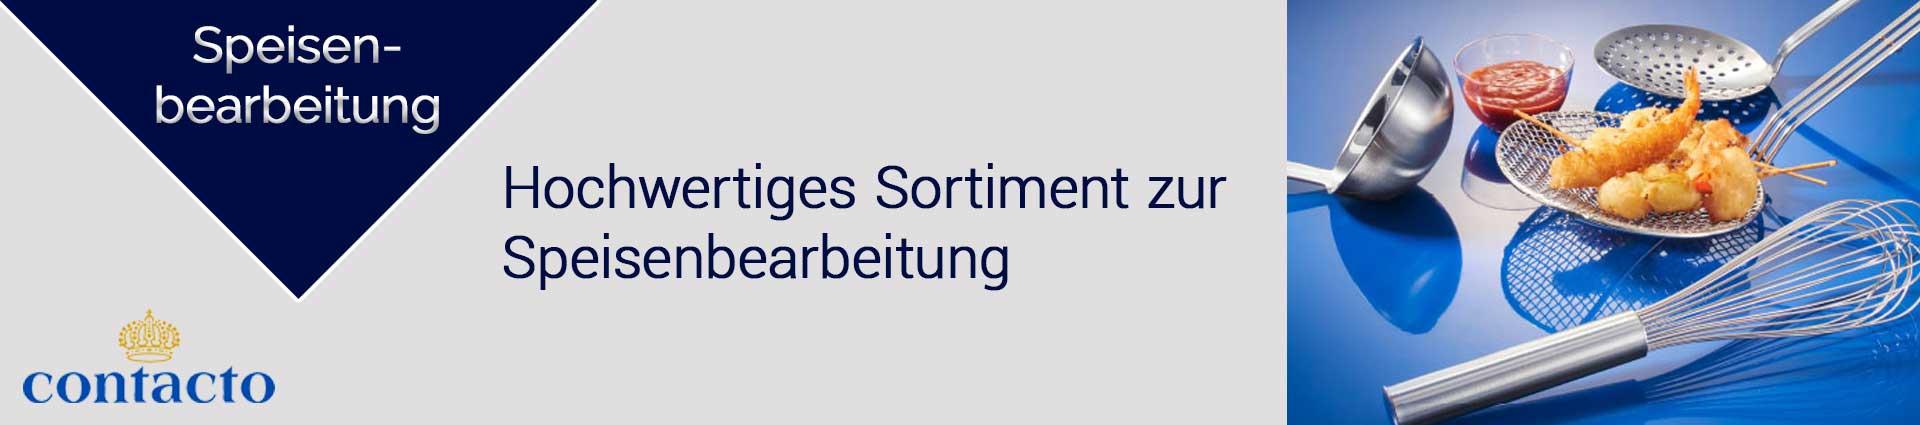 Contacto Speisenbearbeitung Banner